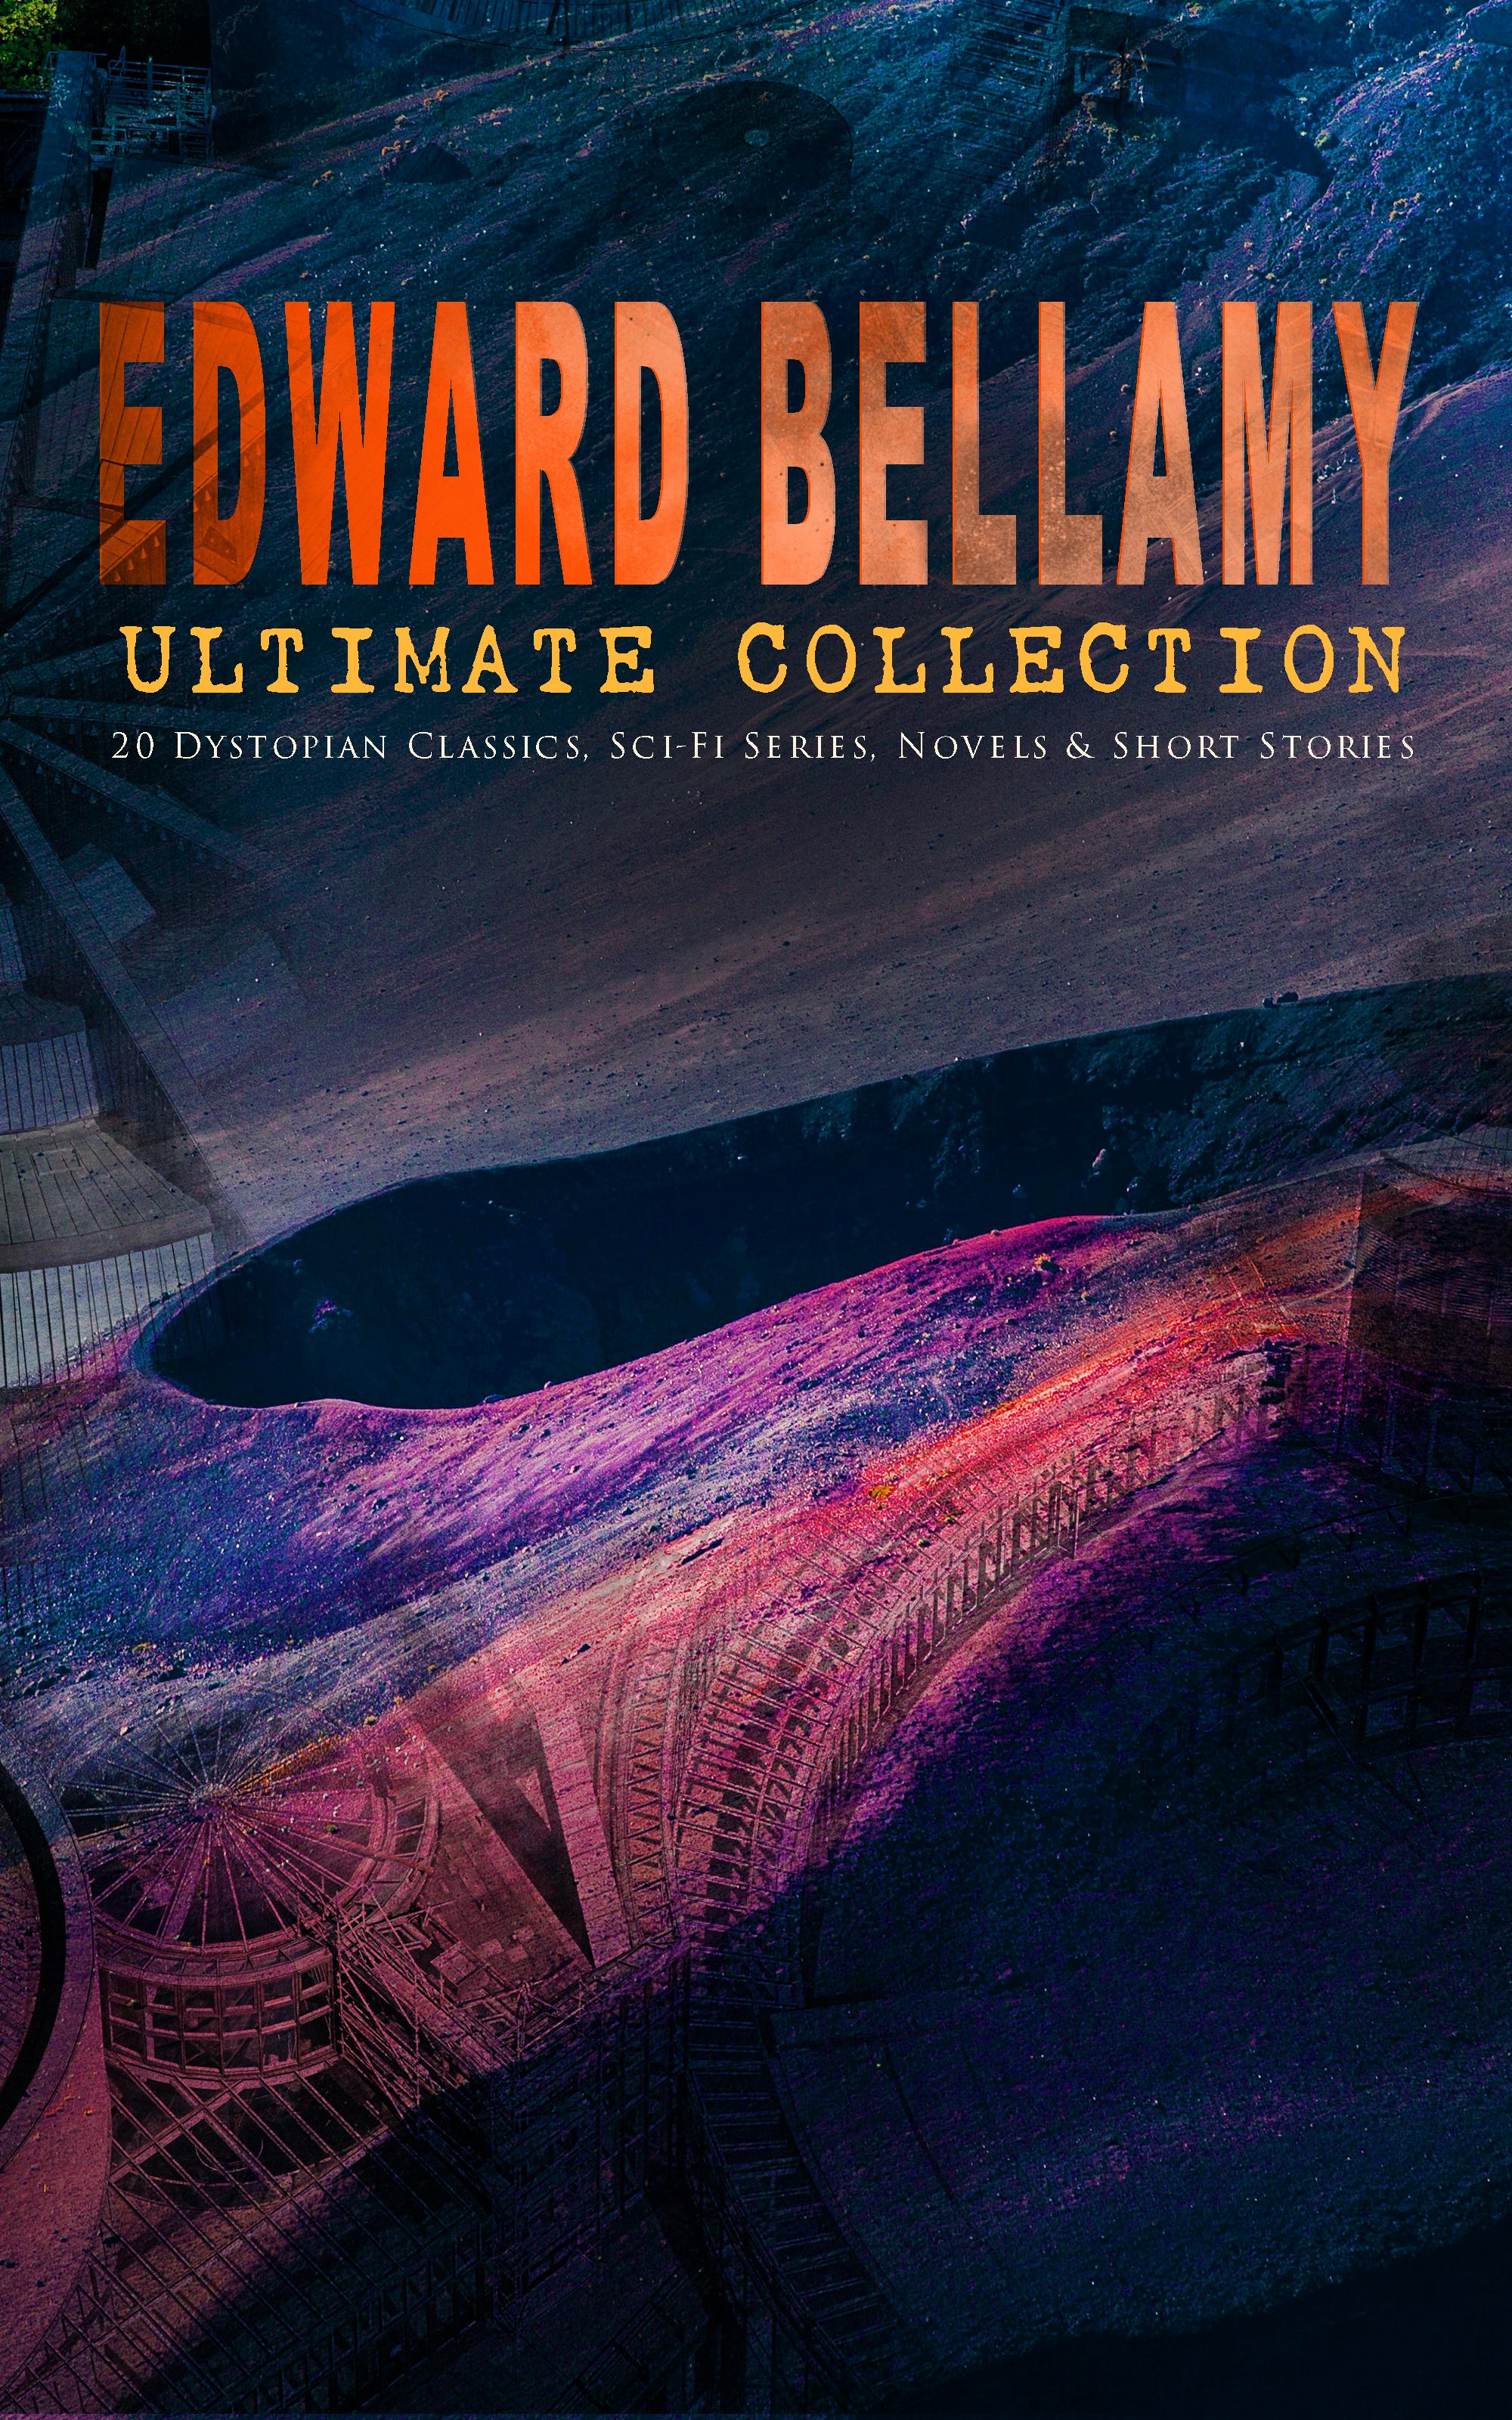 Edward Bellamy EDWARD BELLAMY Ultimate Collection: 20 Dystopian Classics, Sci-Fi Series, Novels & Short Stories брюки edward achour